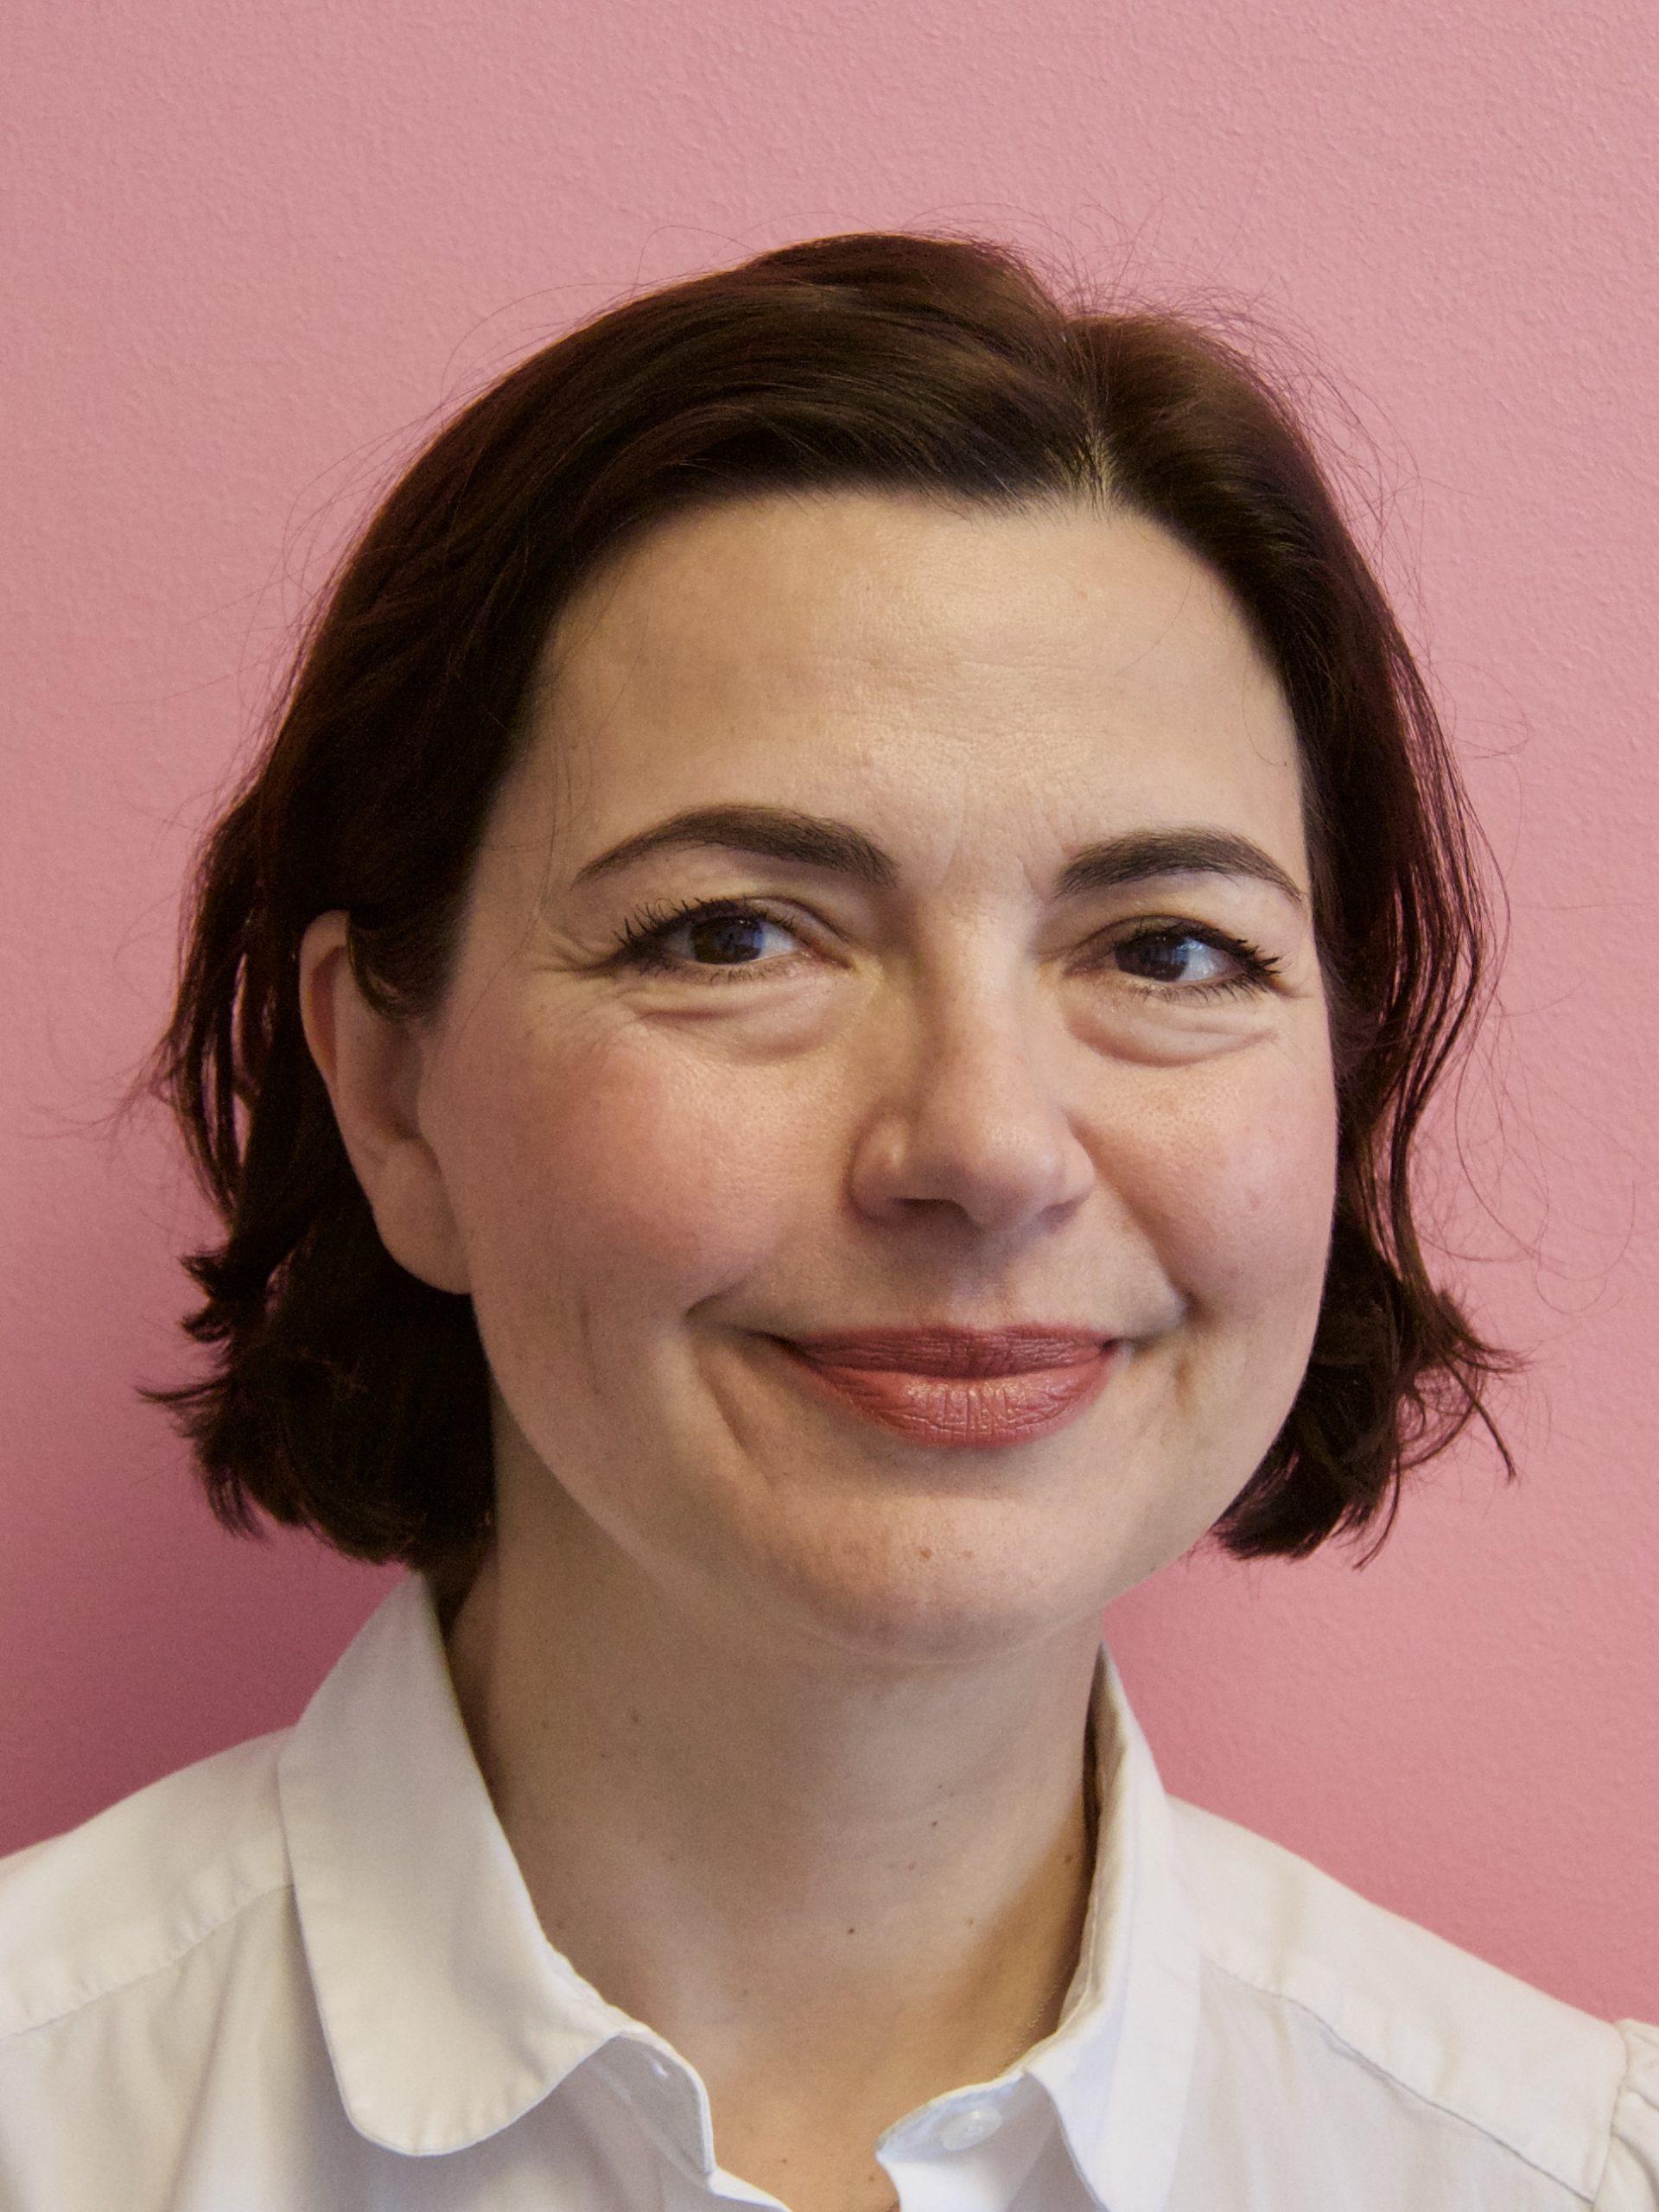 Maja Kiefhaber